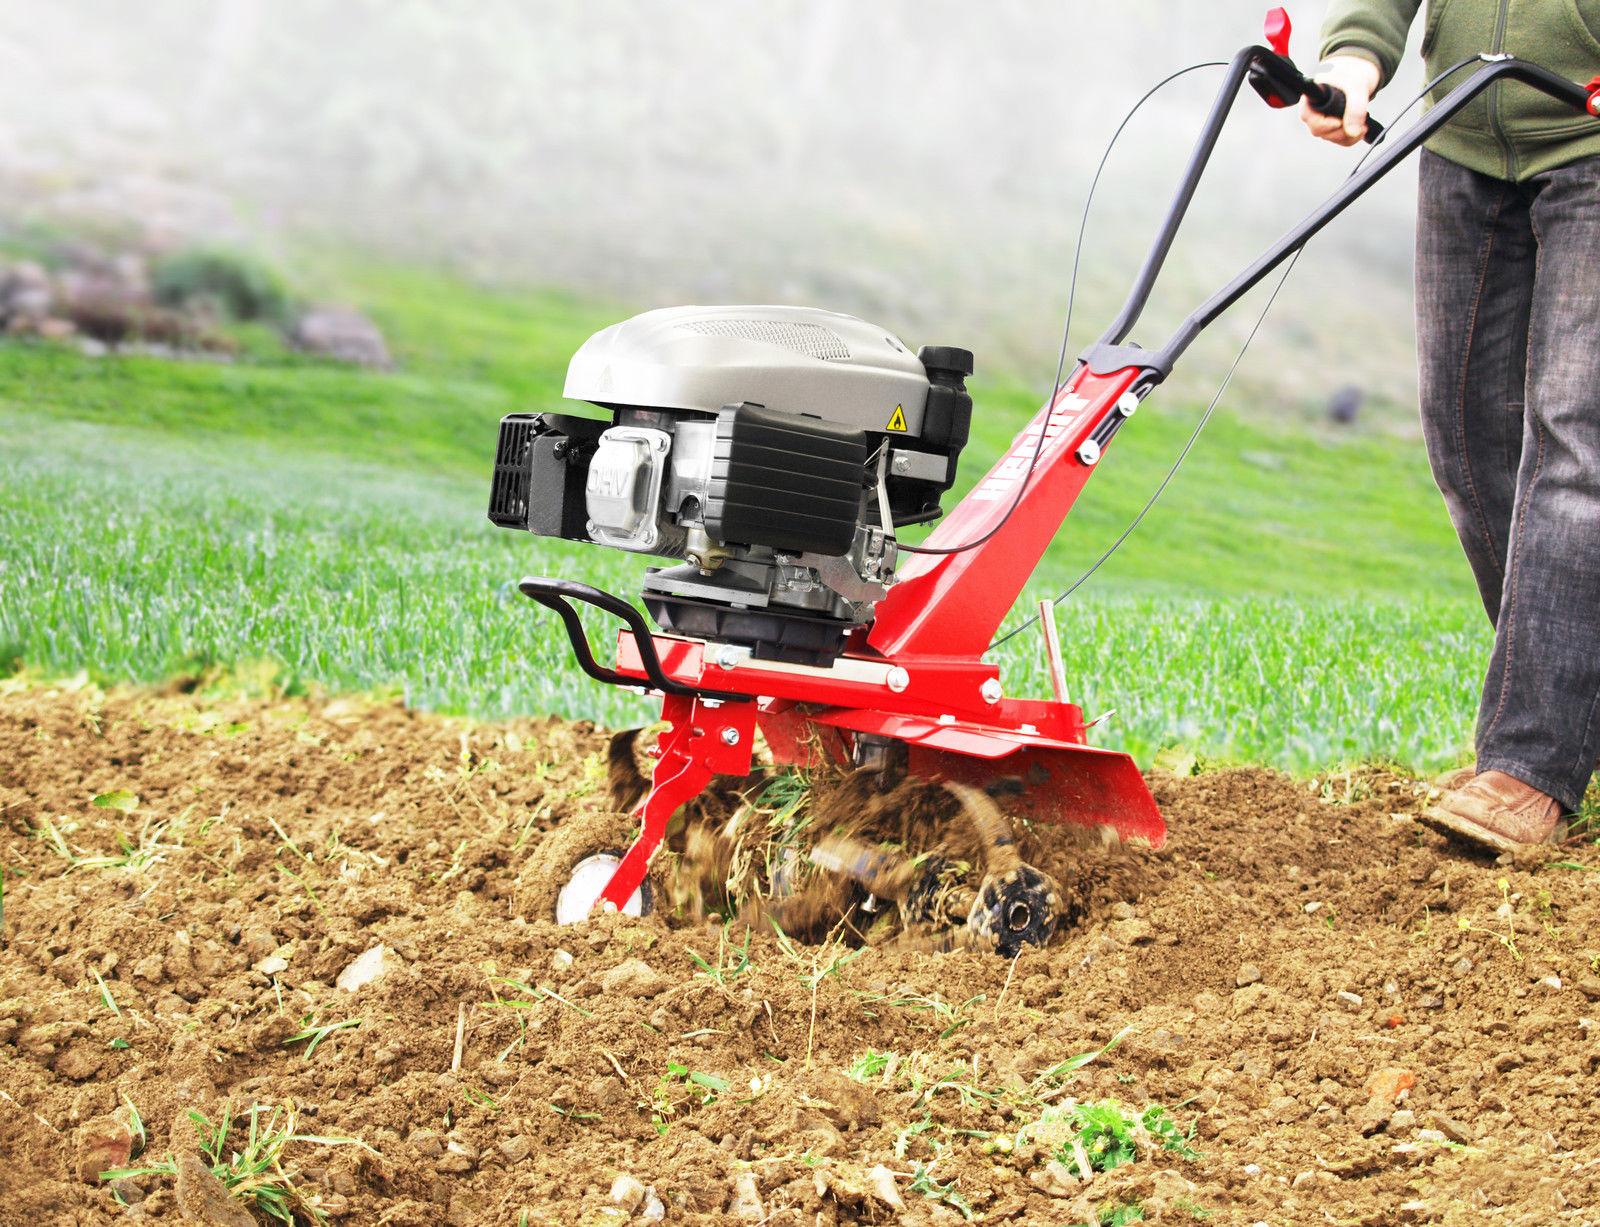 H746 Benzin Gartenfräse Motorhacke Bodenfräse Kultivator Fräse Hacke Bodenhacke